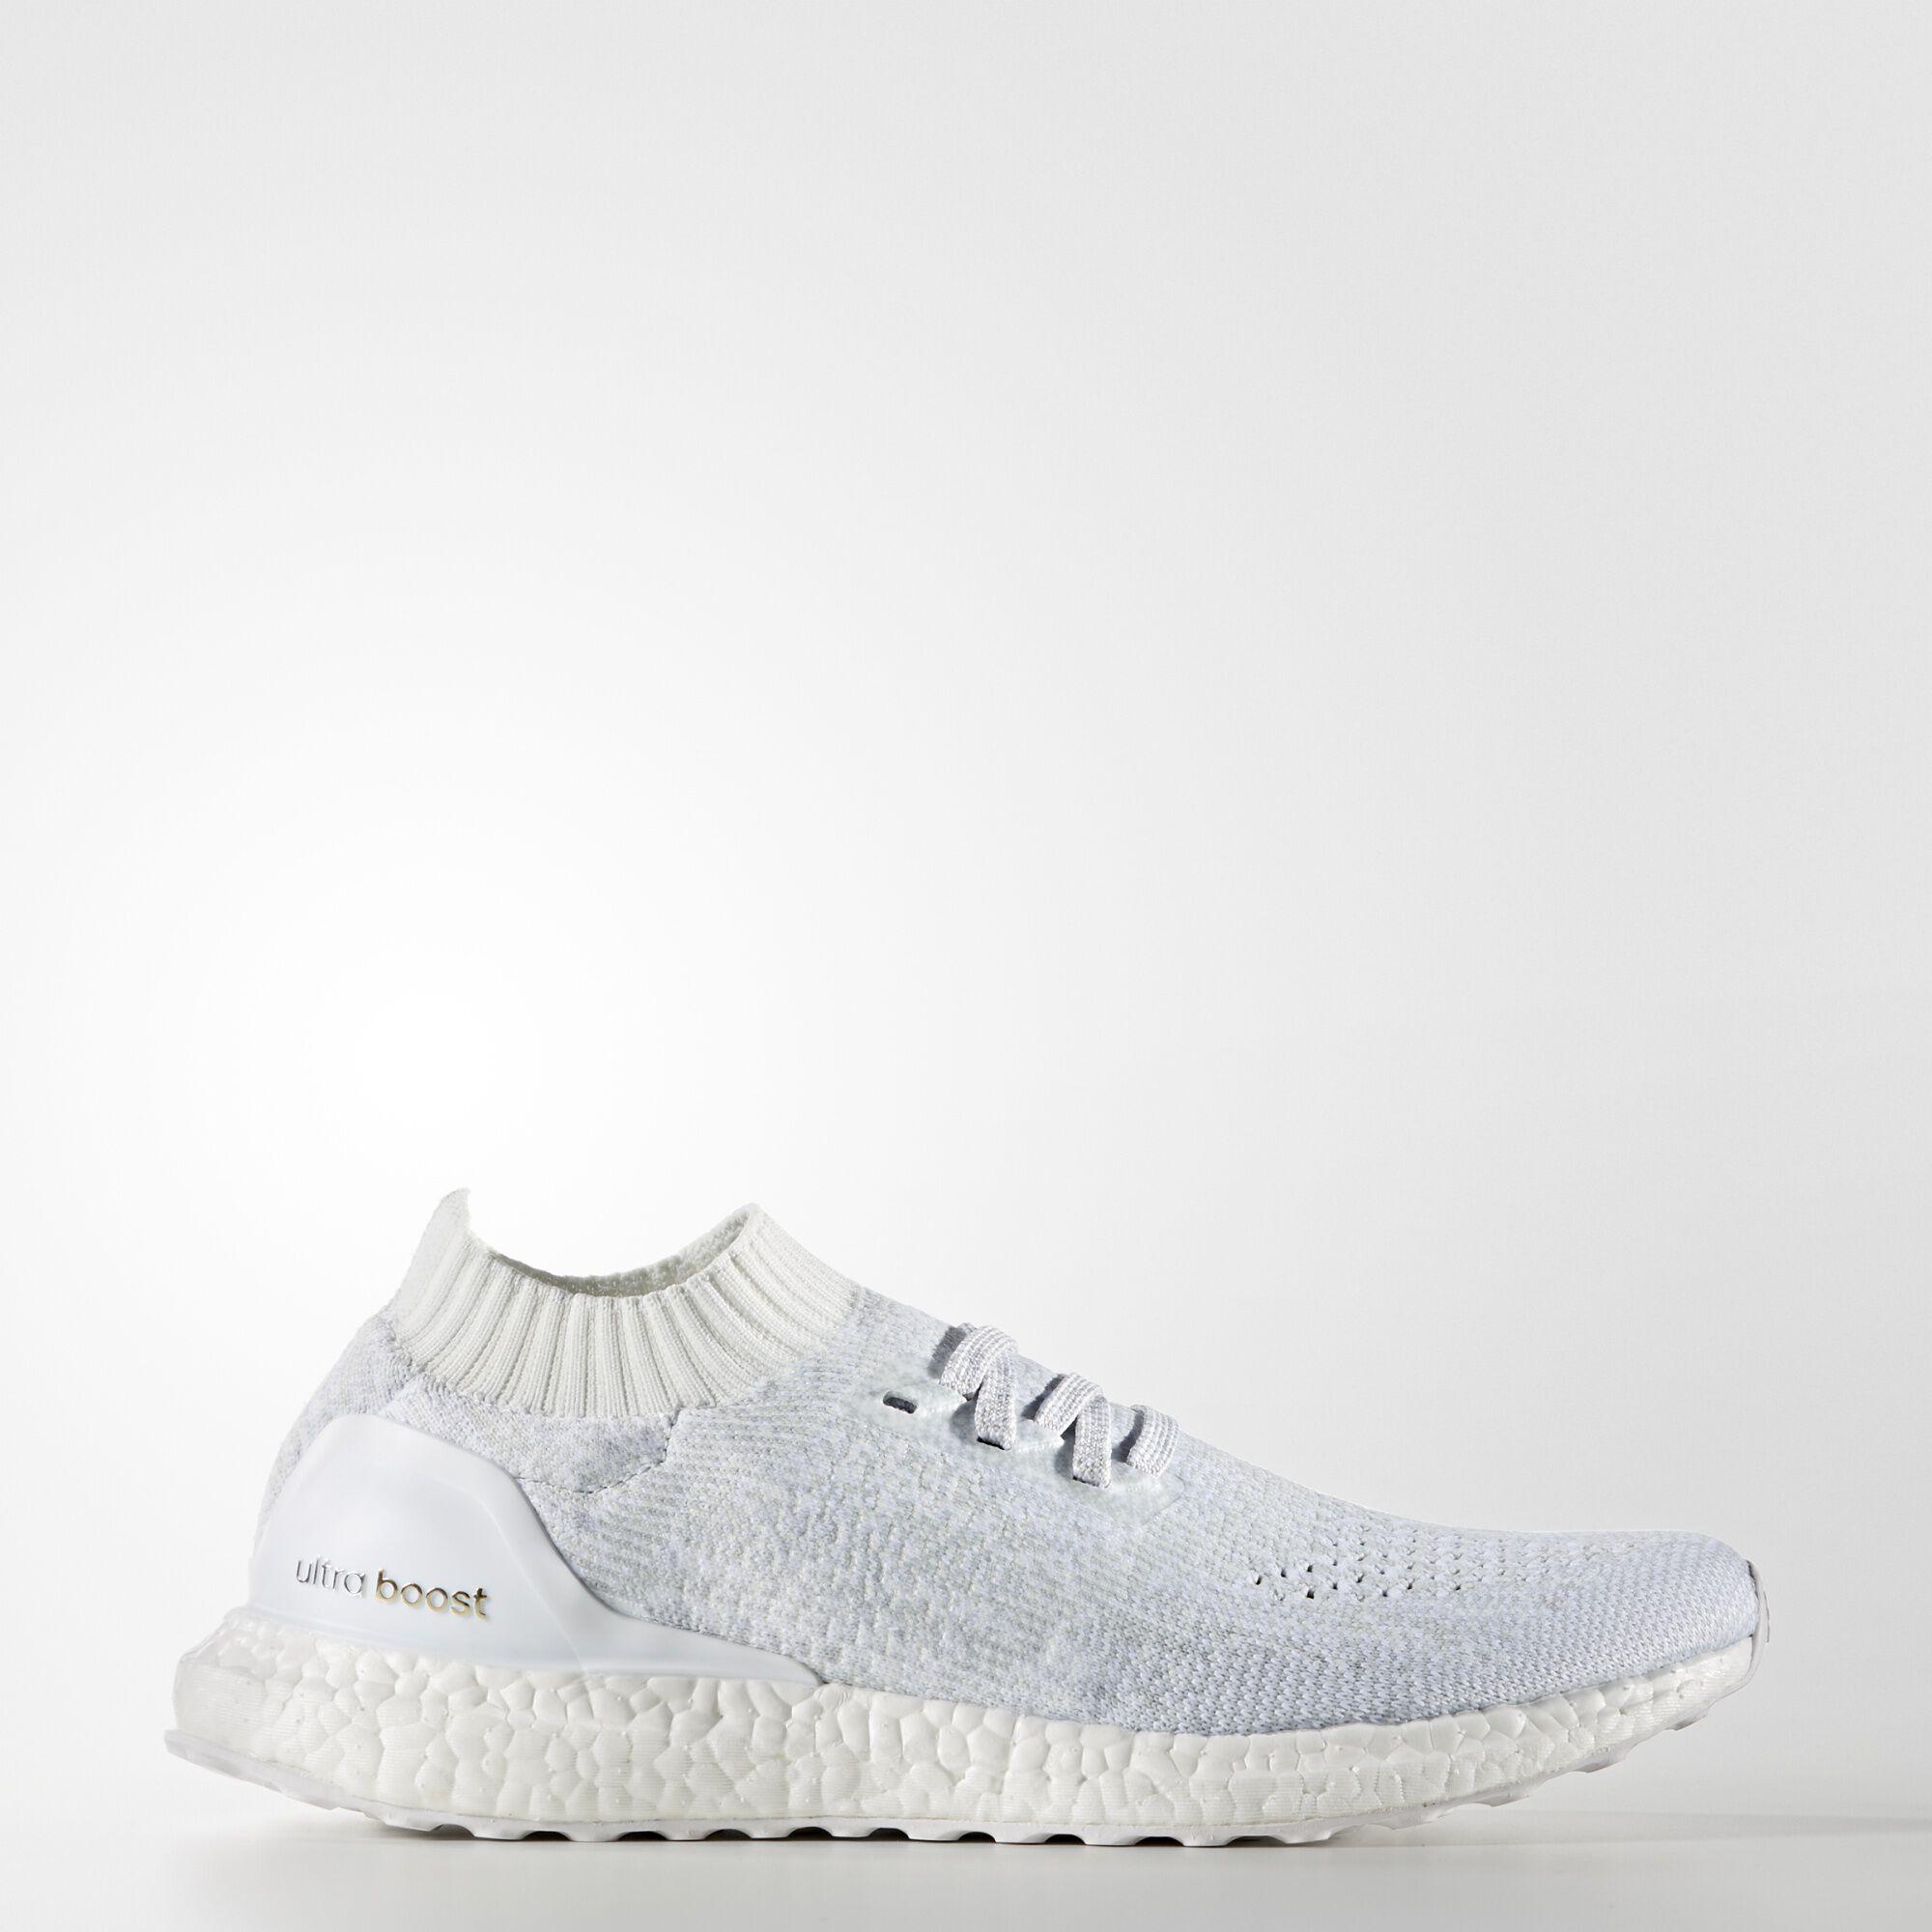 47e0846441c adidas ultra boost uncaged white